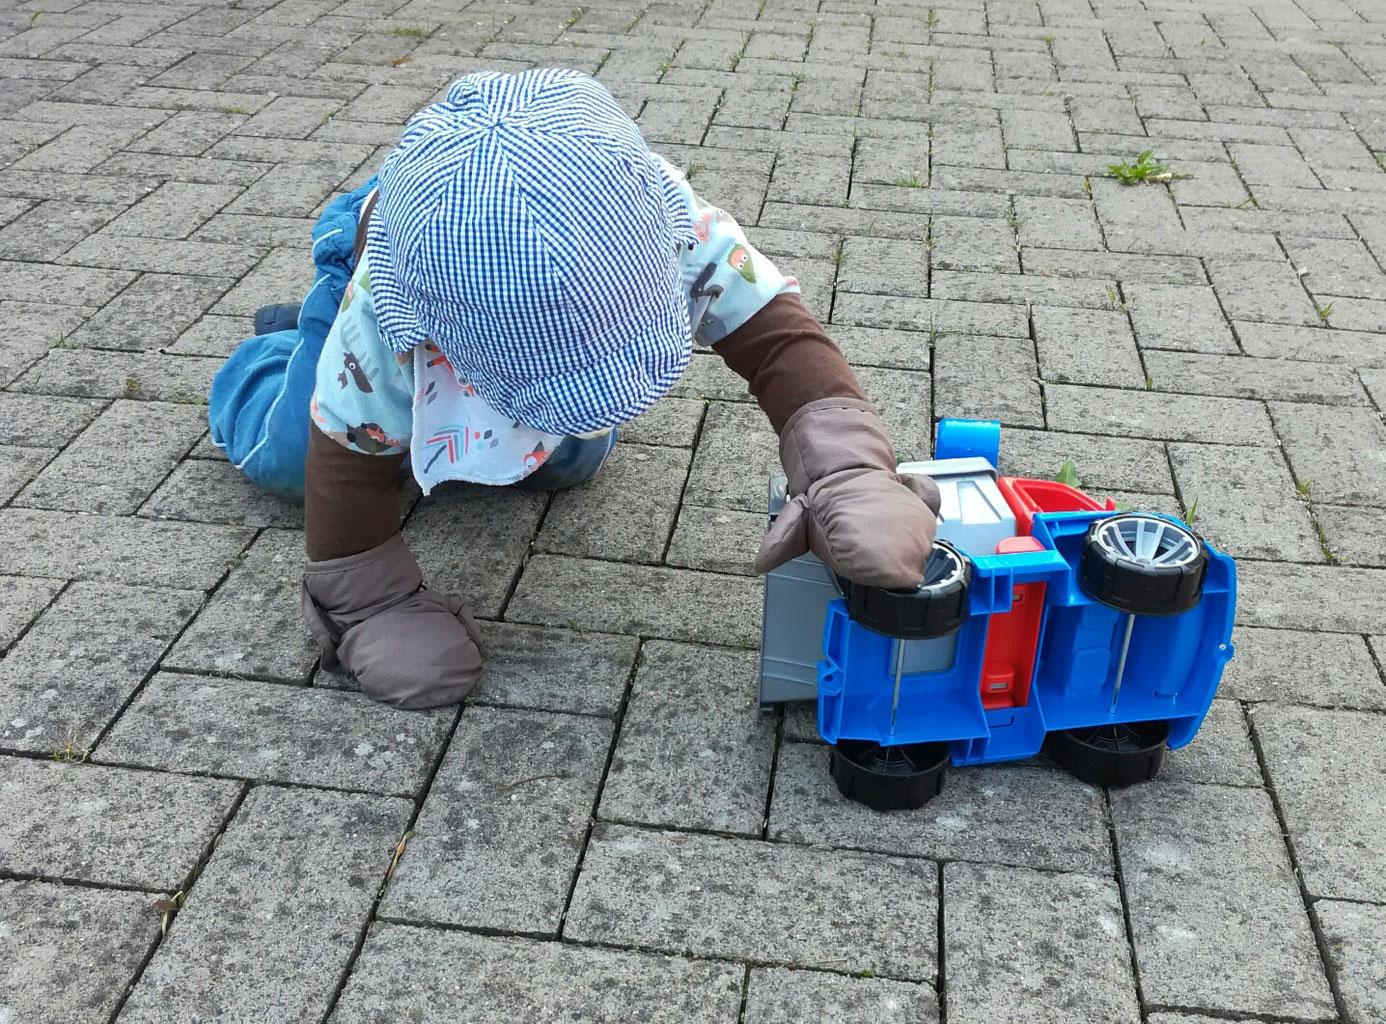 Handschuhe schützen die zarte Kinderhaut.